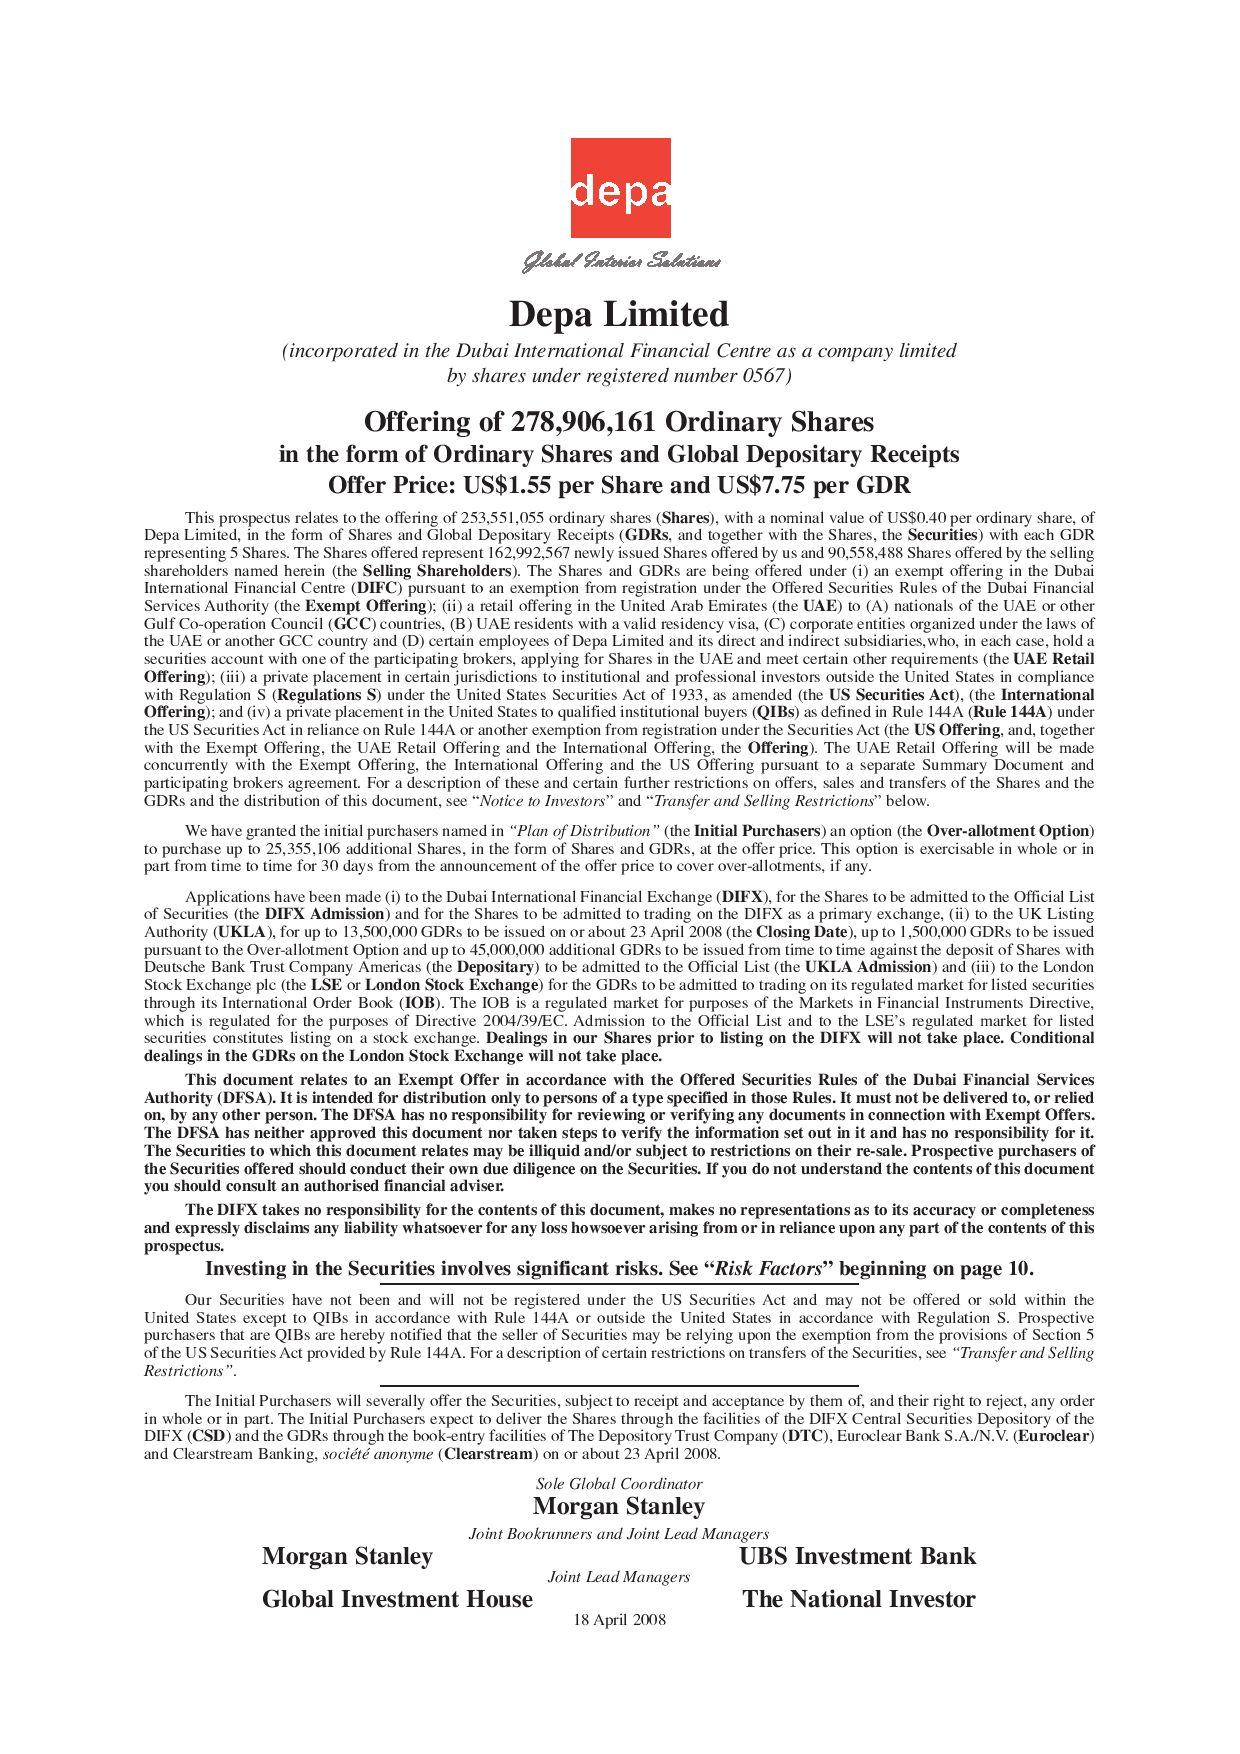 Ipo prospectus by depa united group issuu biocorpaavc Gallery